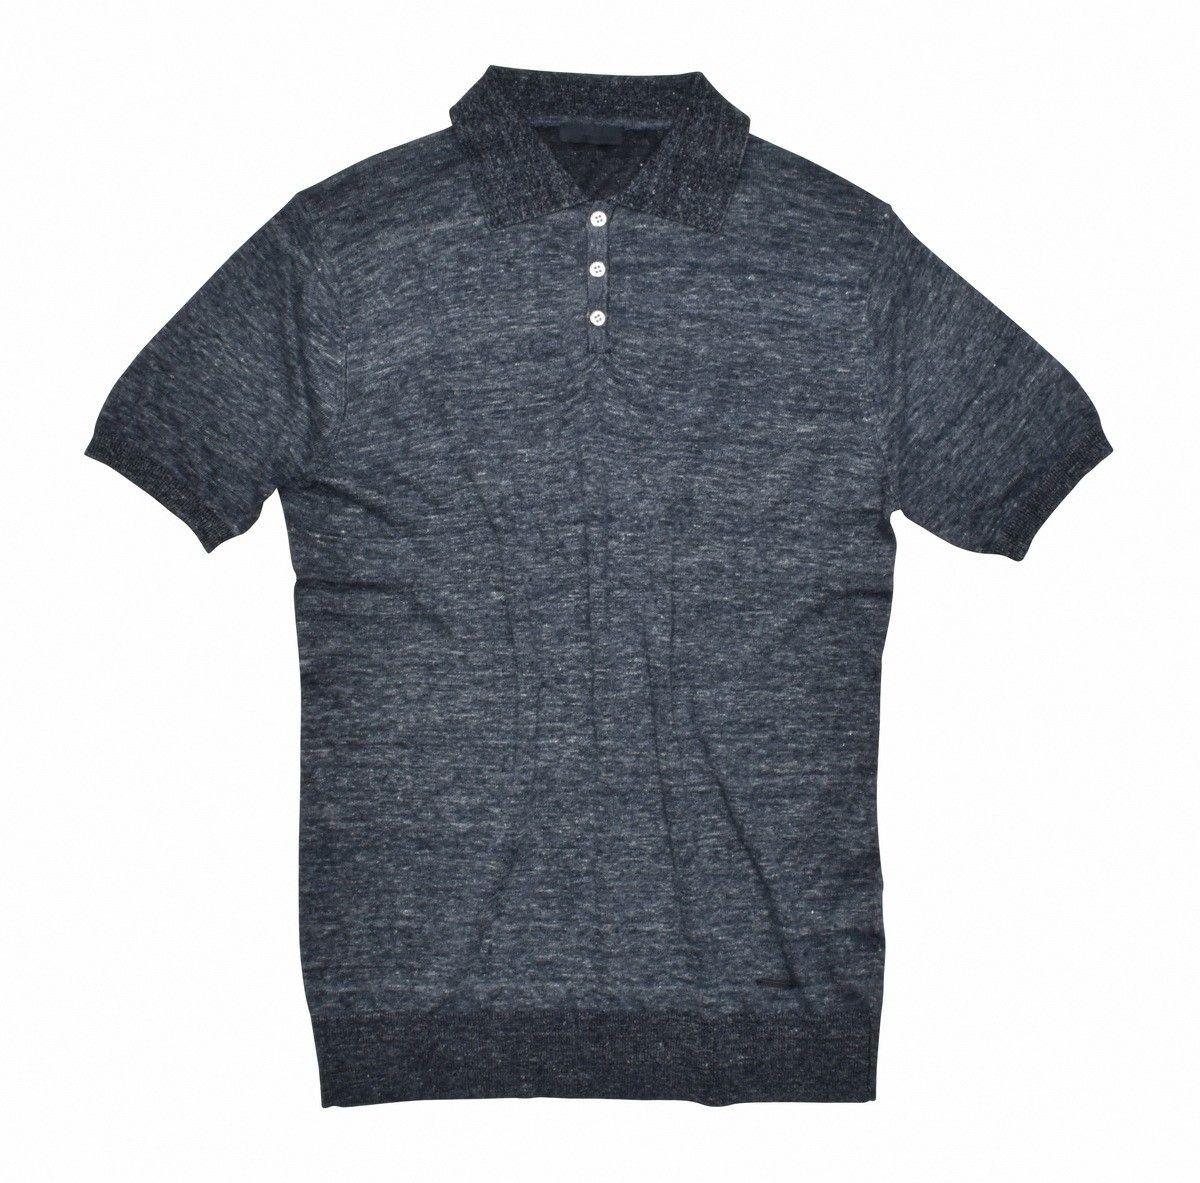 DRAKEWOOD - Herren Polo T-Shirt Kit - Navy